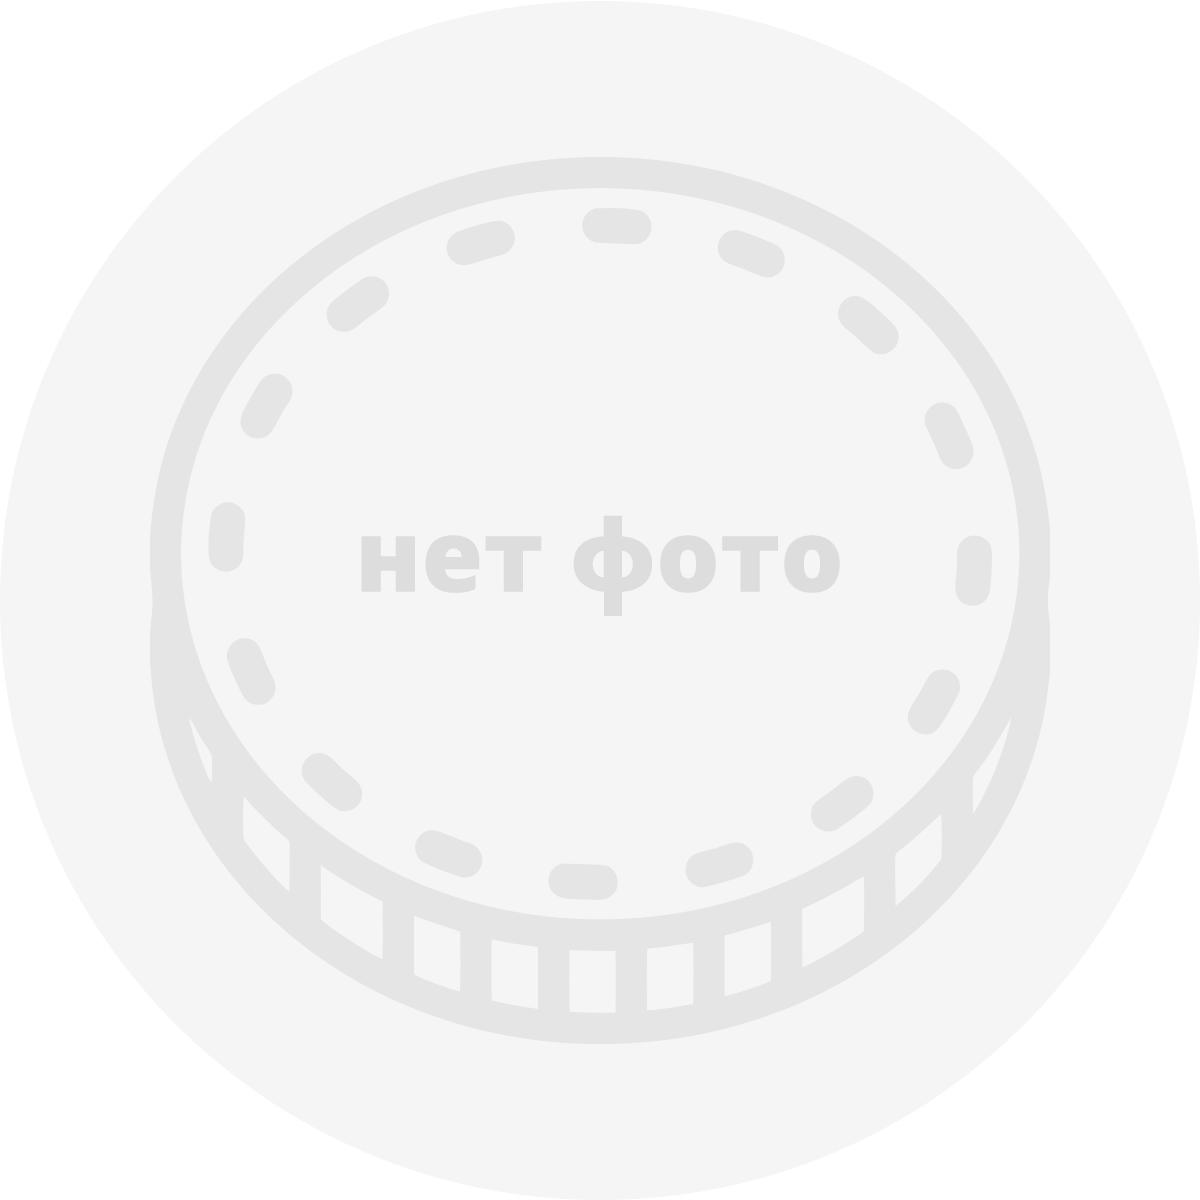 Финляндия, 5 евро (2015 г.)